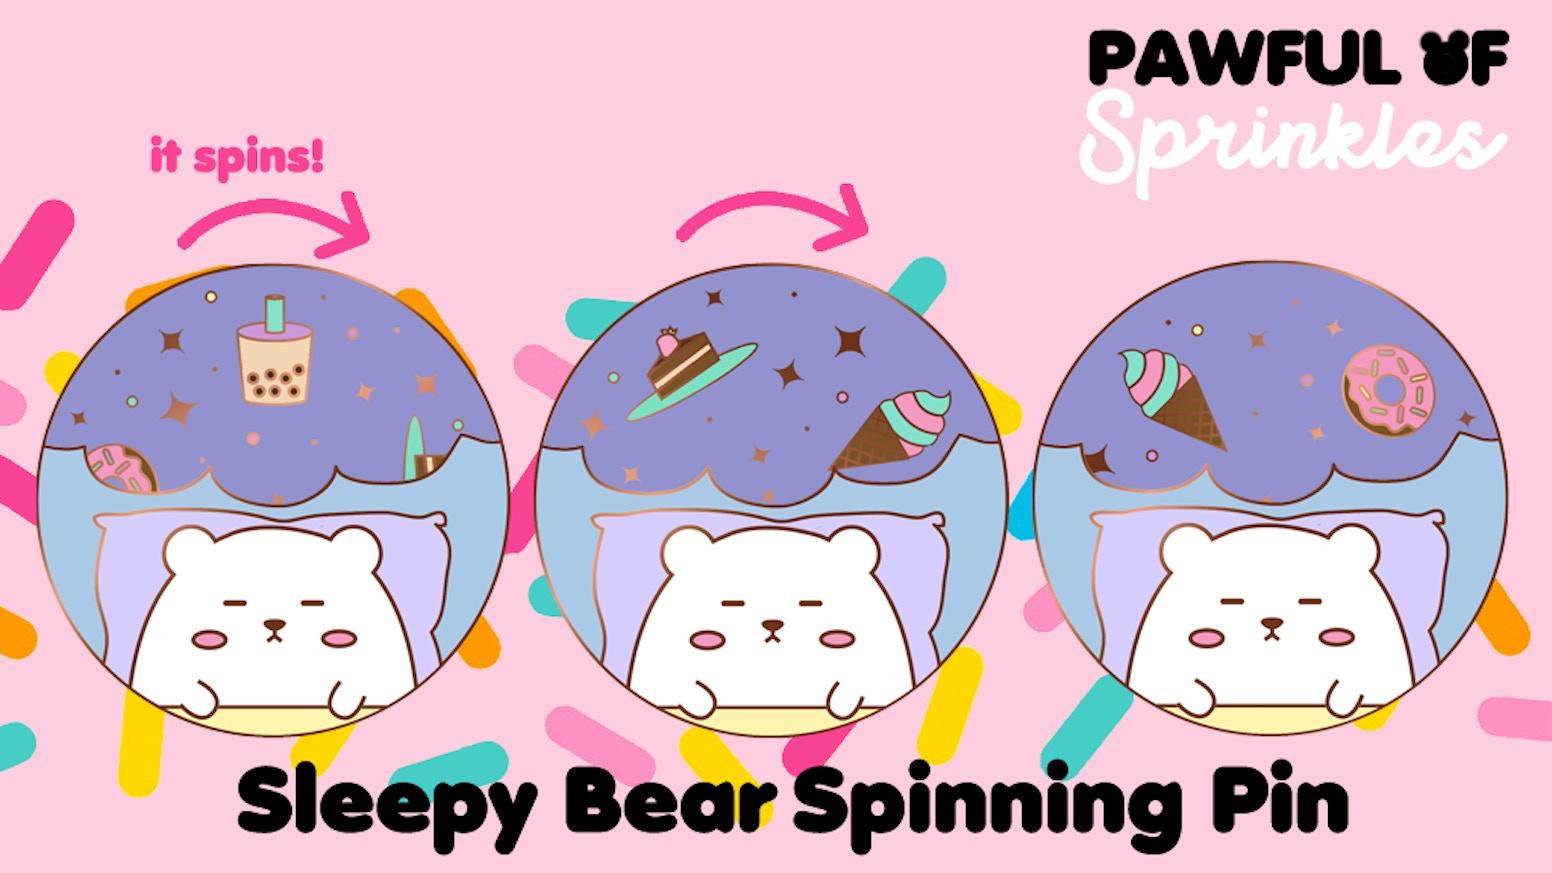 Sleepy Bear Spinning Enamel Pin - an adorable quickstarter